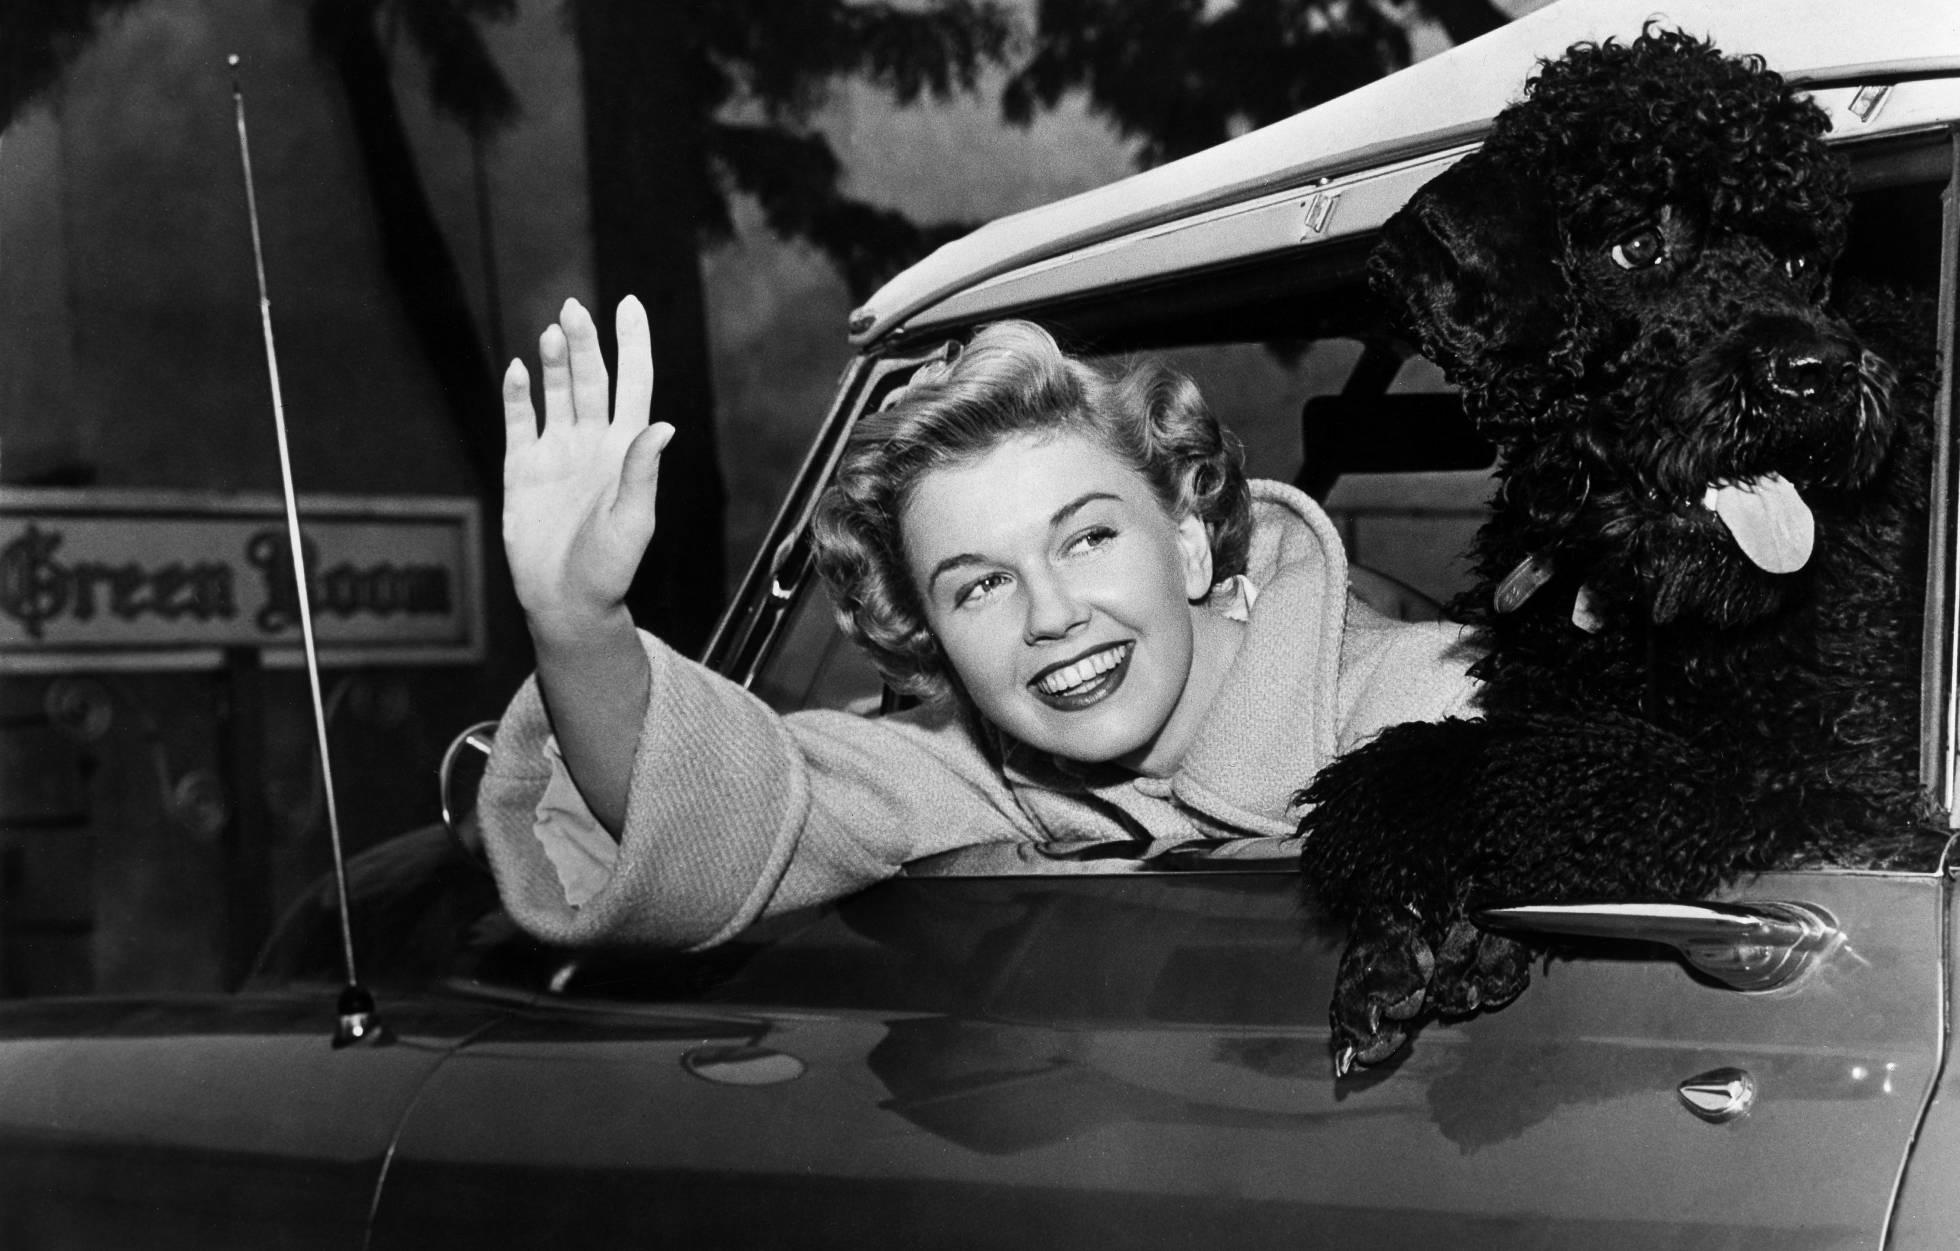 Doris Day, Muerte, Muere, Actriz, Hollywood, Doris Day Foundation, Cine, Cantante, Retro, Cine Clásico,